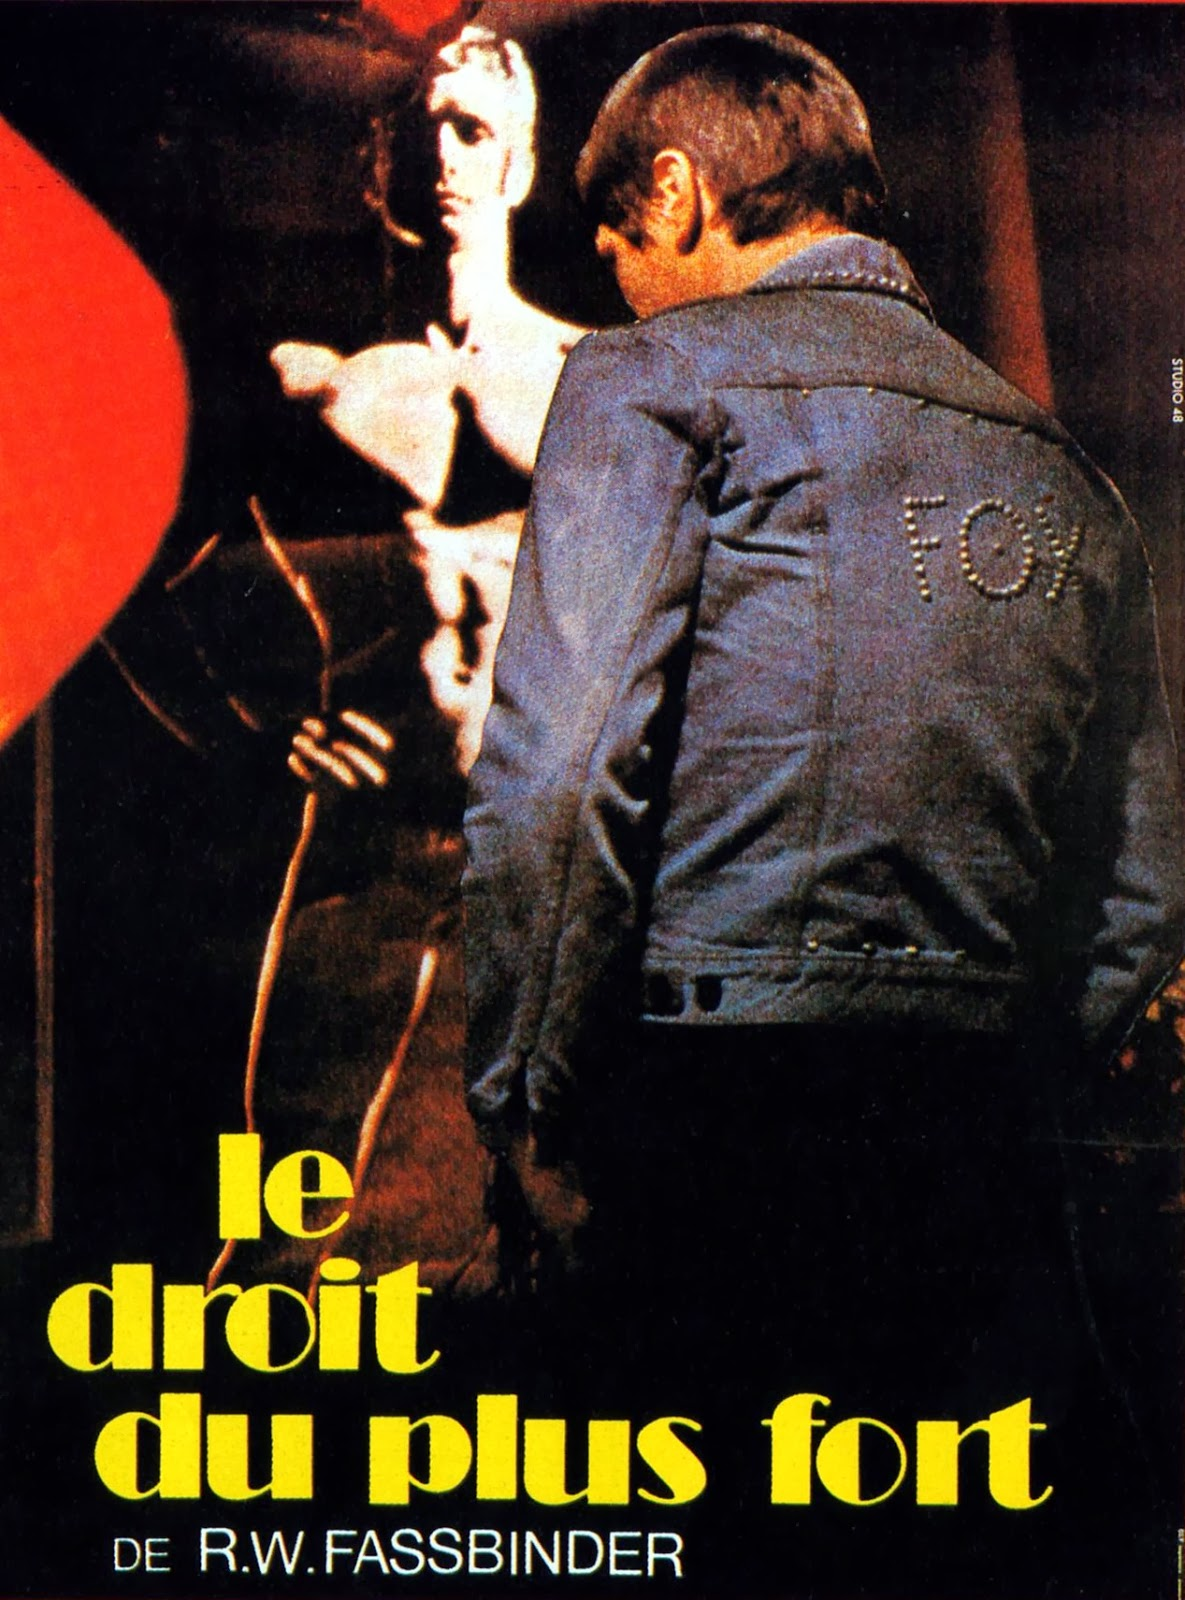 Strani filmski reditelji  - Page 3 Le-droit-du-plus-fort-french-poster-2